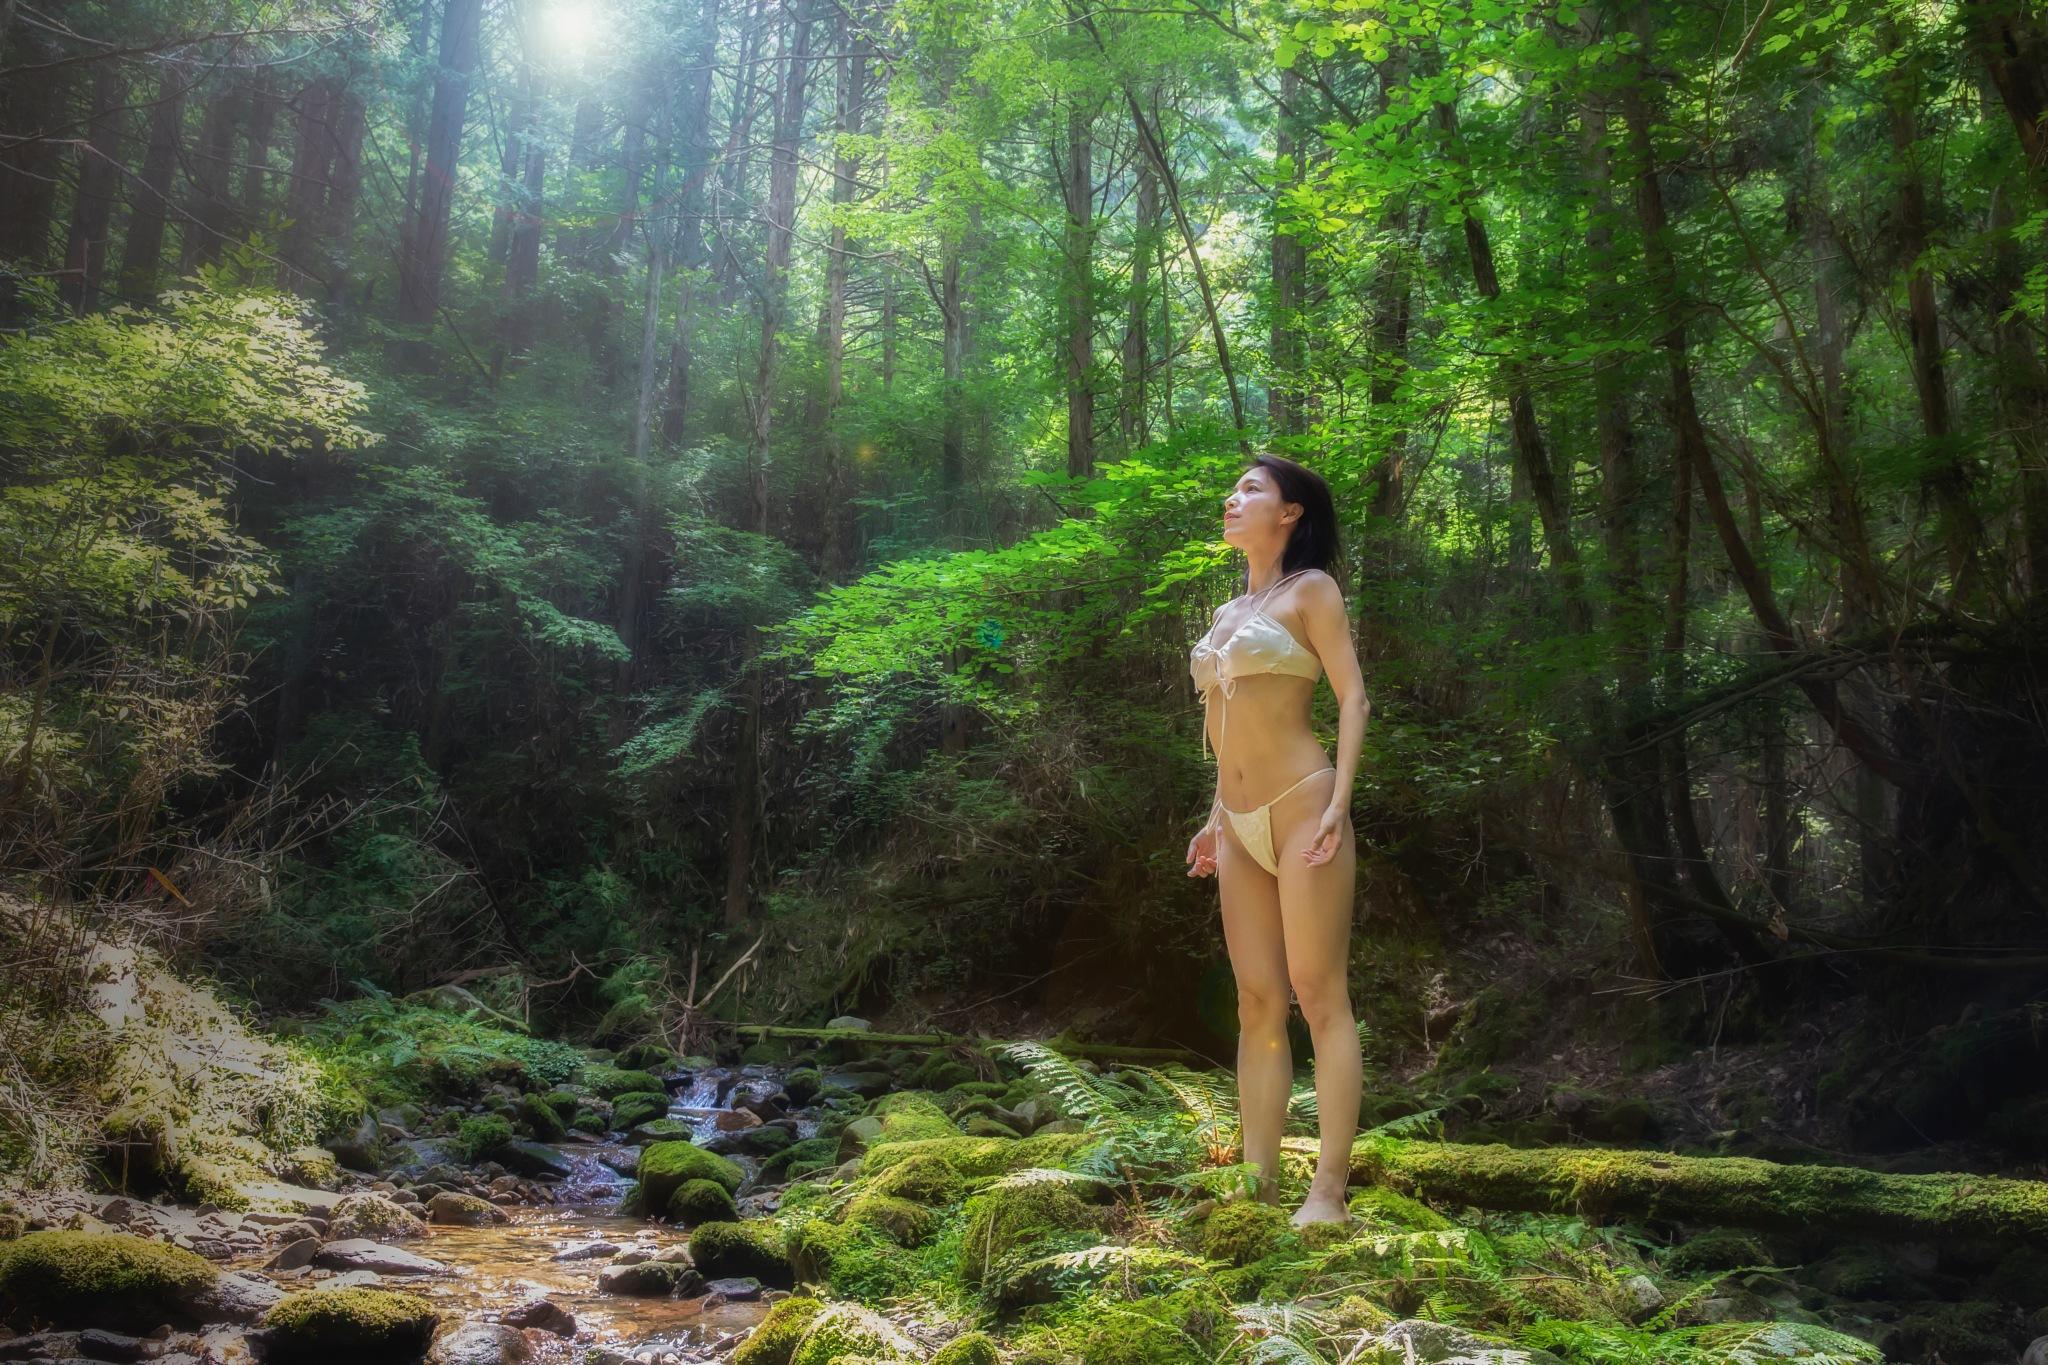 The Air by tokifumi hayamizu